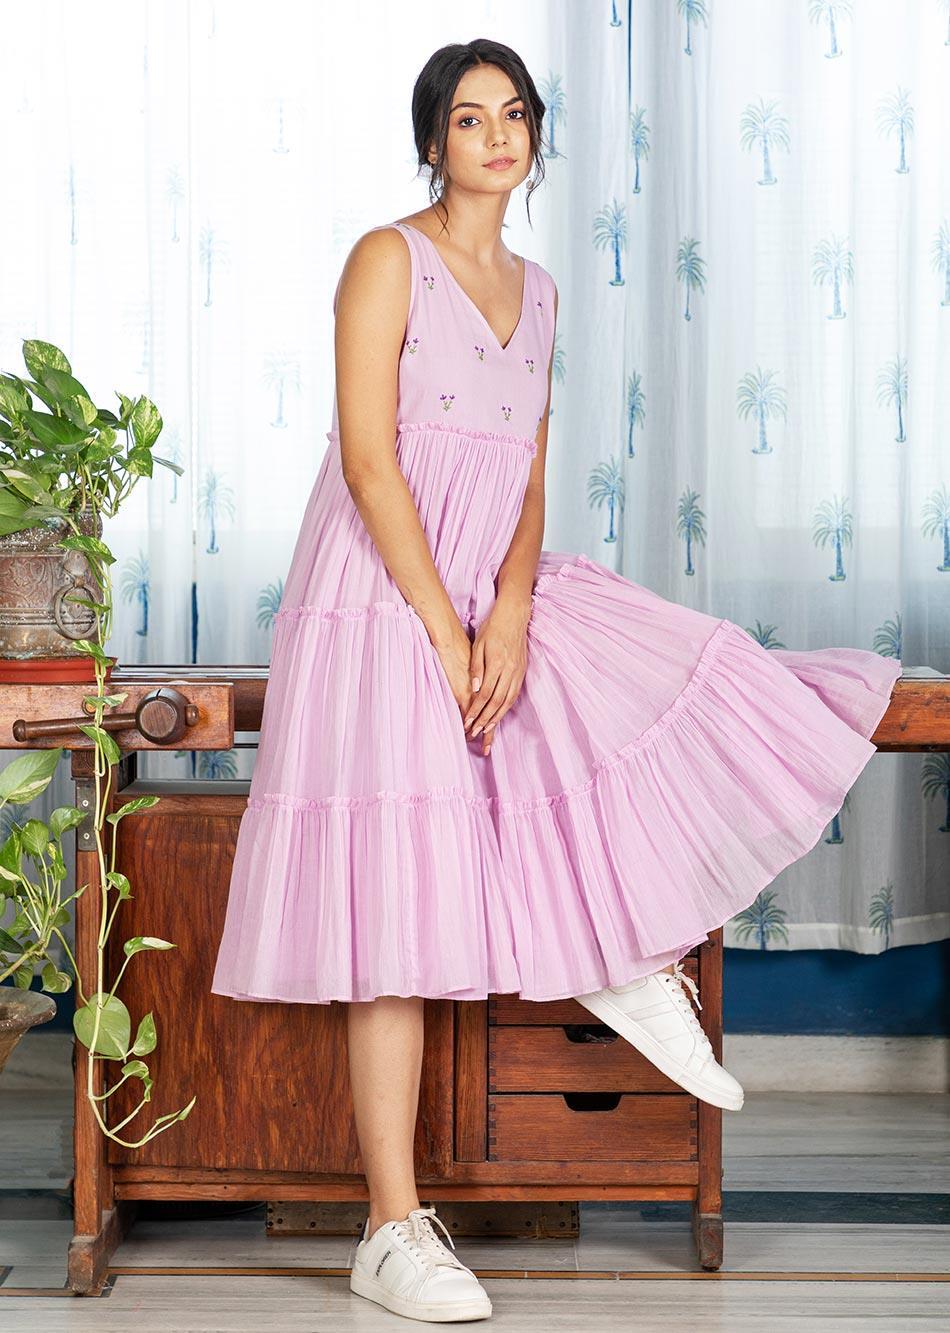 ROSE REPOSE DRESS By Jovi Fashion